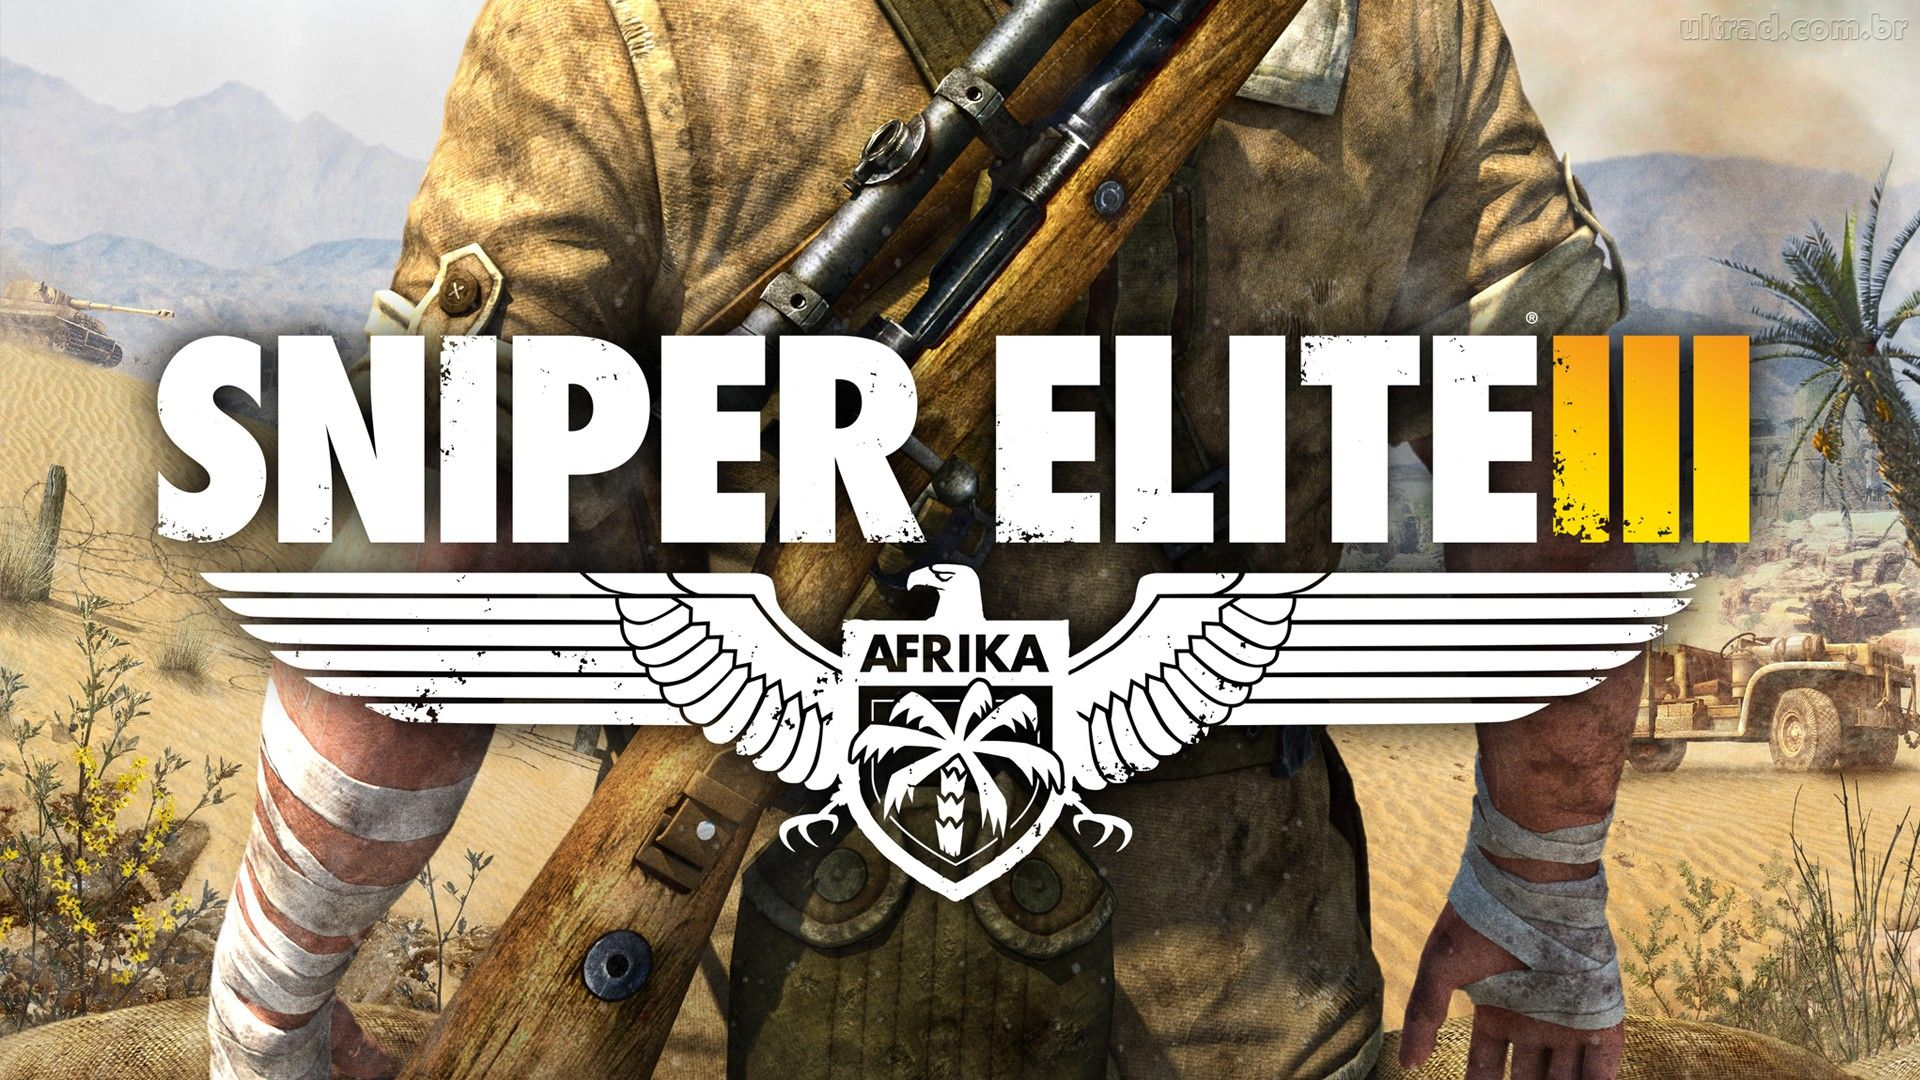 Sniper Elite 3 Wallpaper: 8 Sniper Elite 3 HD Wallpapers